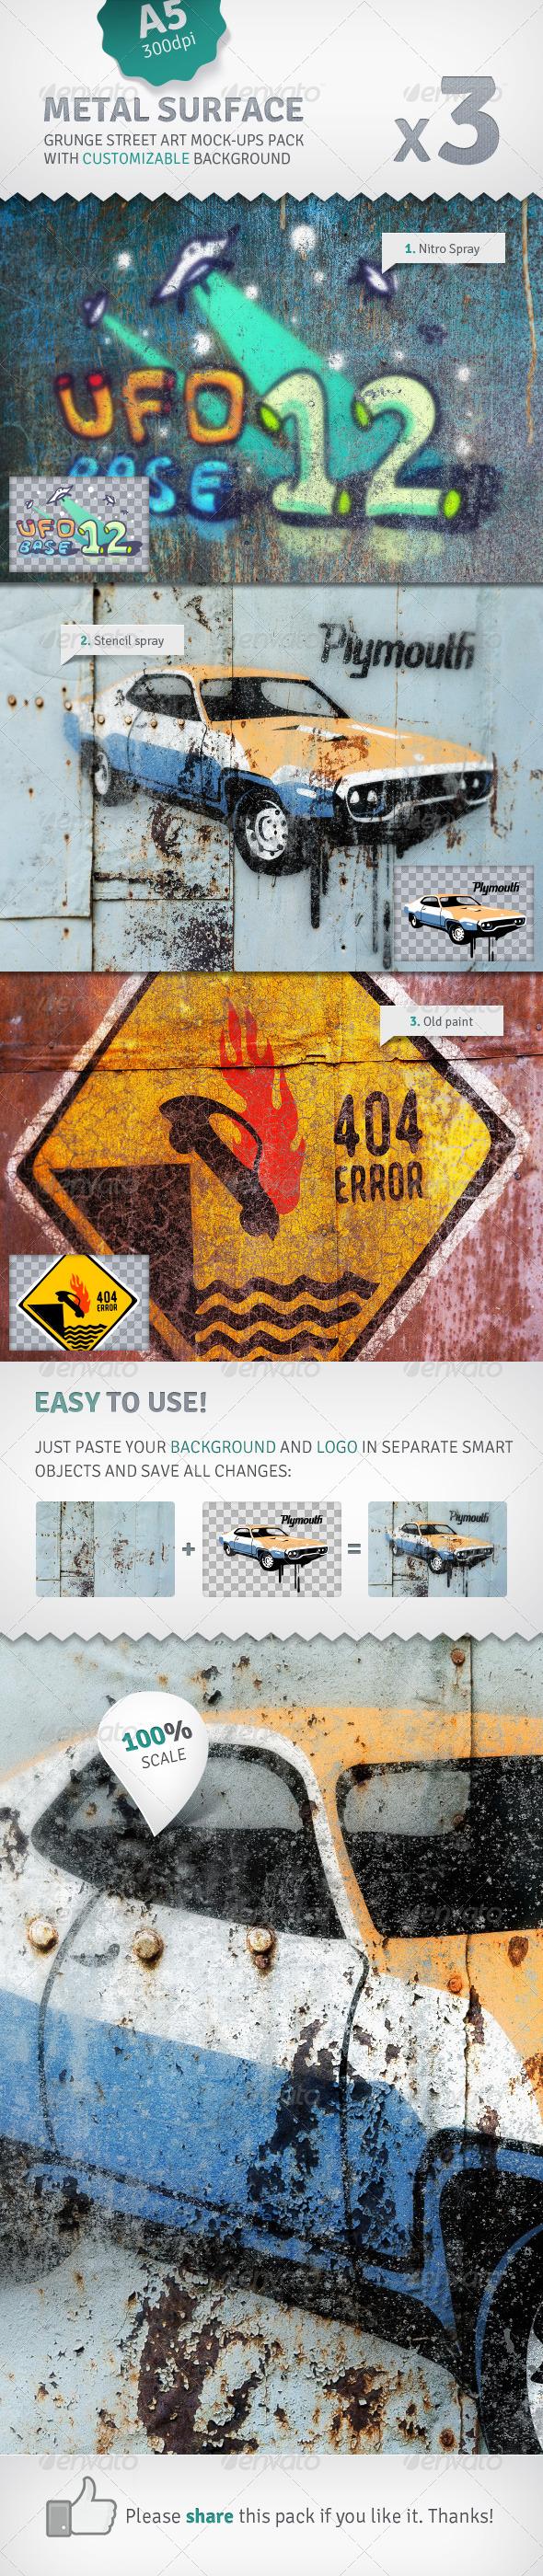 GraphicRiver Metal Surface 3 Graffiti Street Art Mockups 2577209